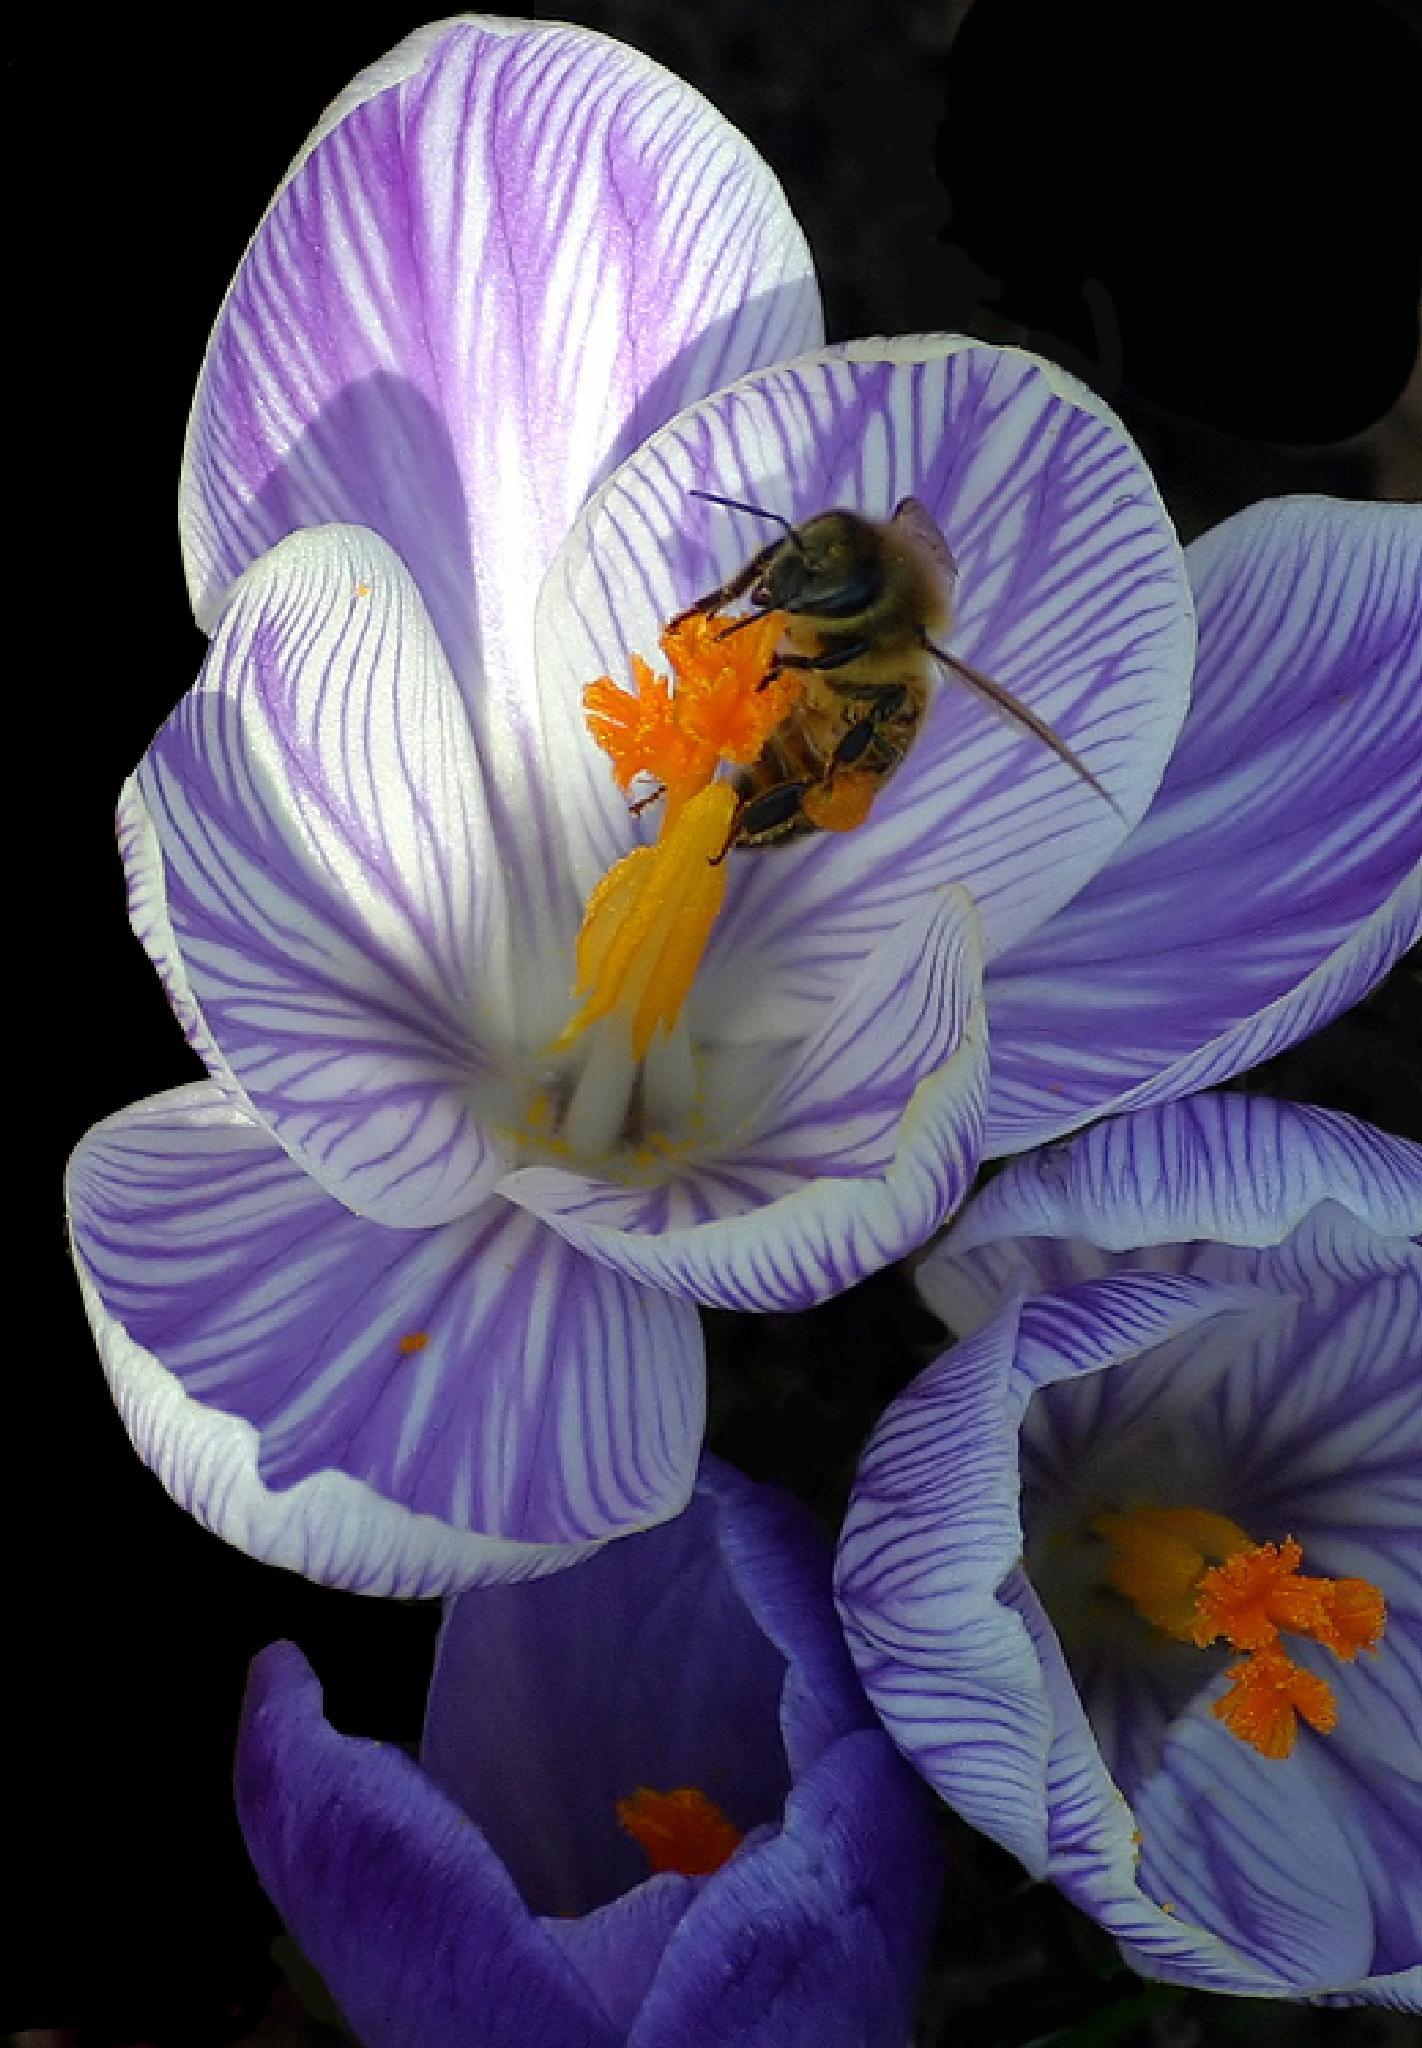 Flower Lover by monanorrman